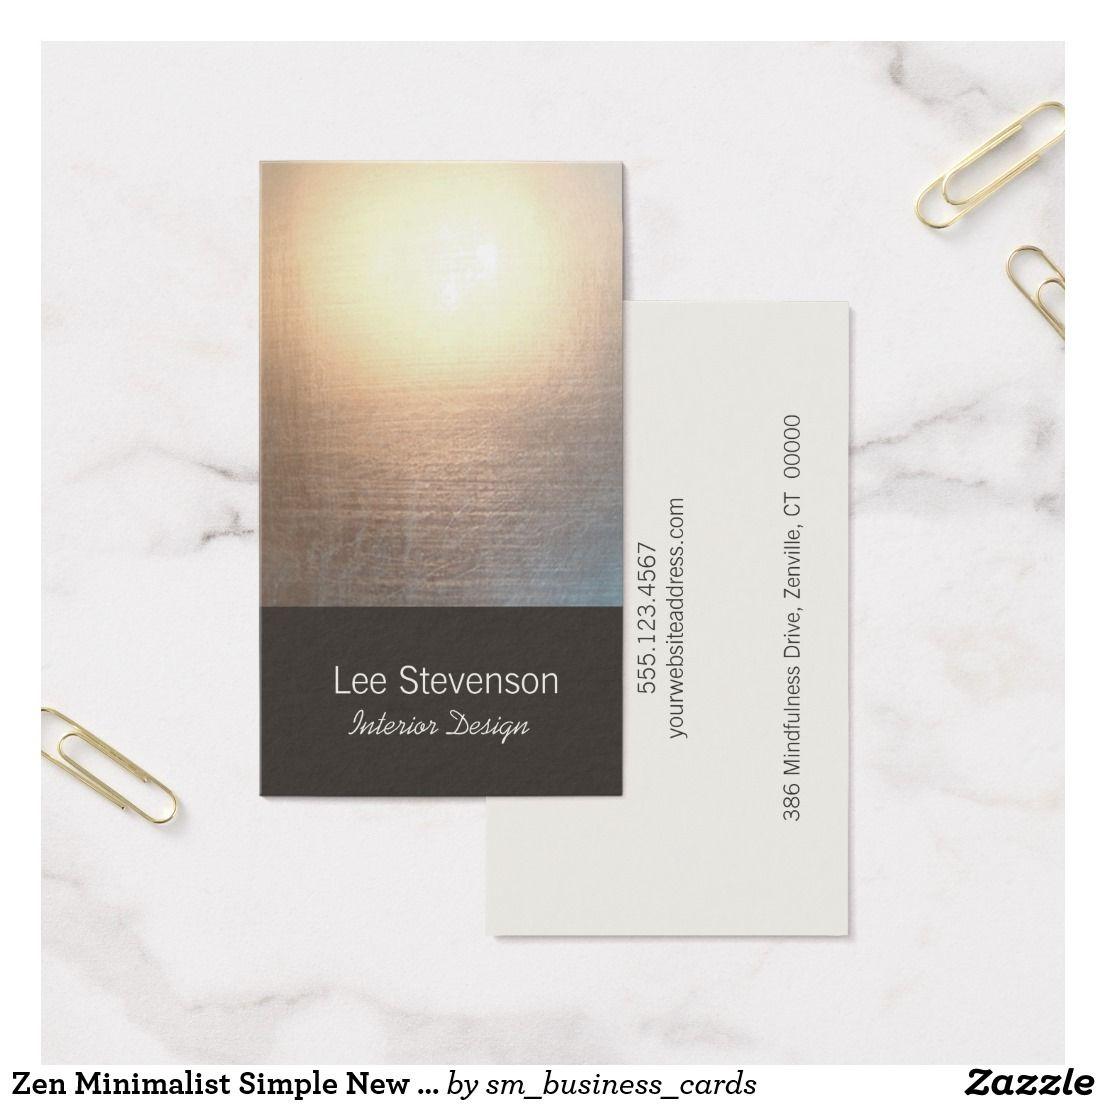 Zen minimalist simple new age interior designer business card zen minimalist simple new age interior designer business card colourmoves